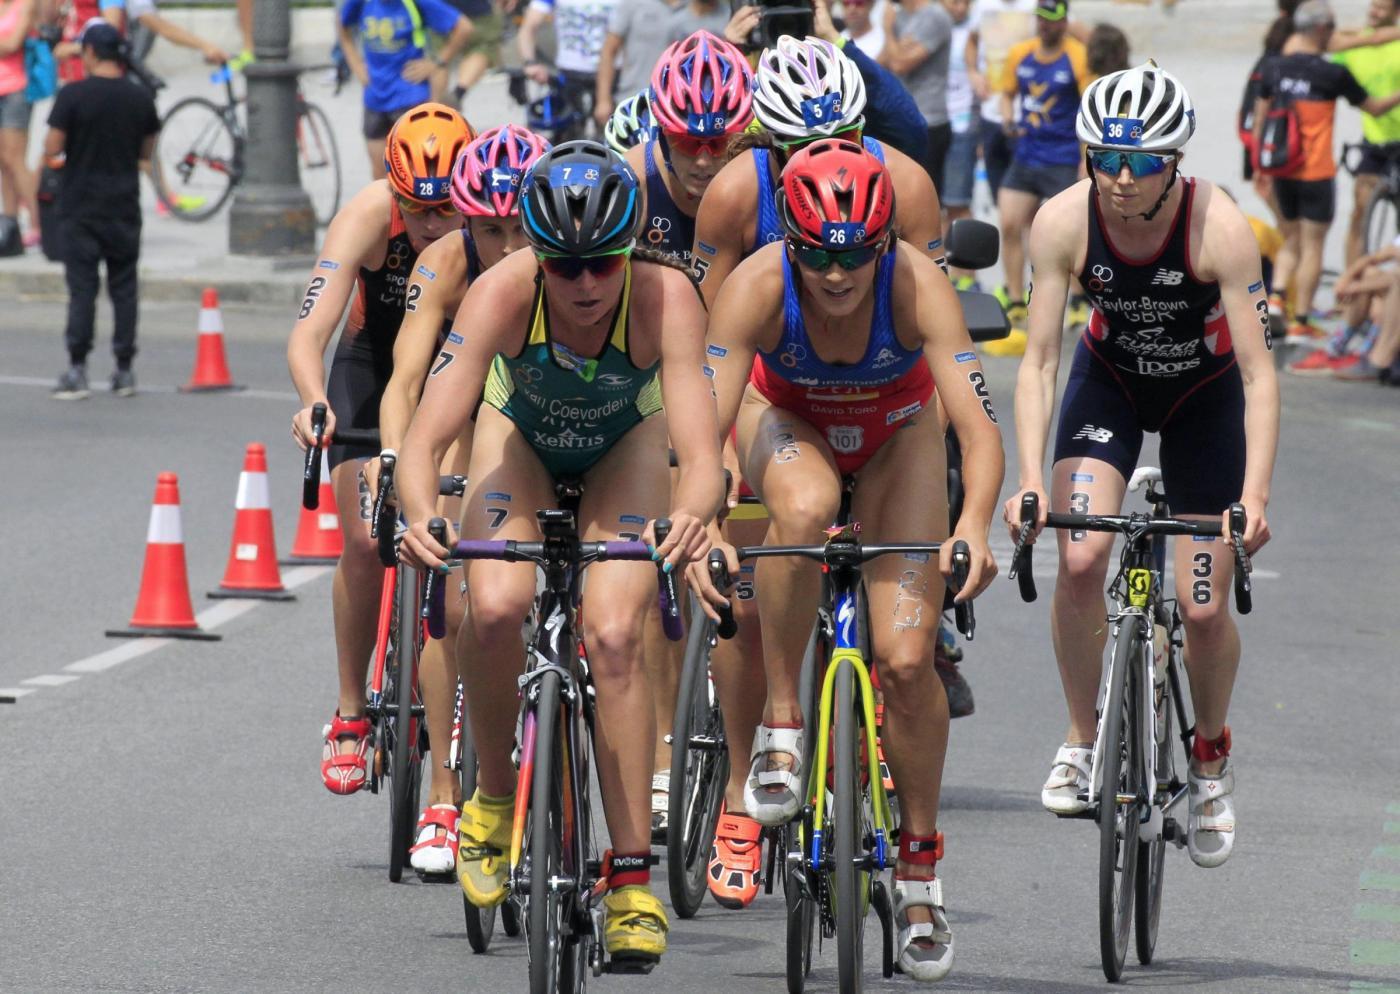 Flora Duffy trionfa nel triathlon femminile